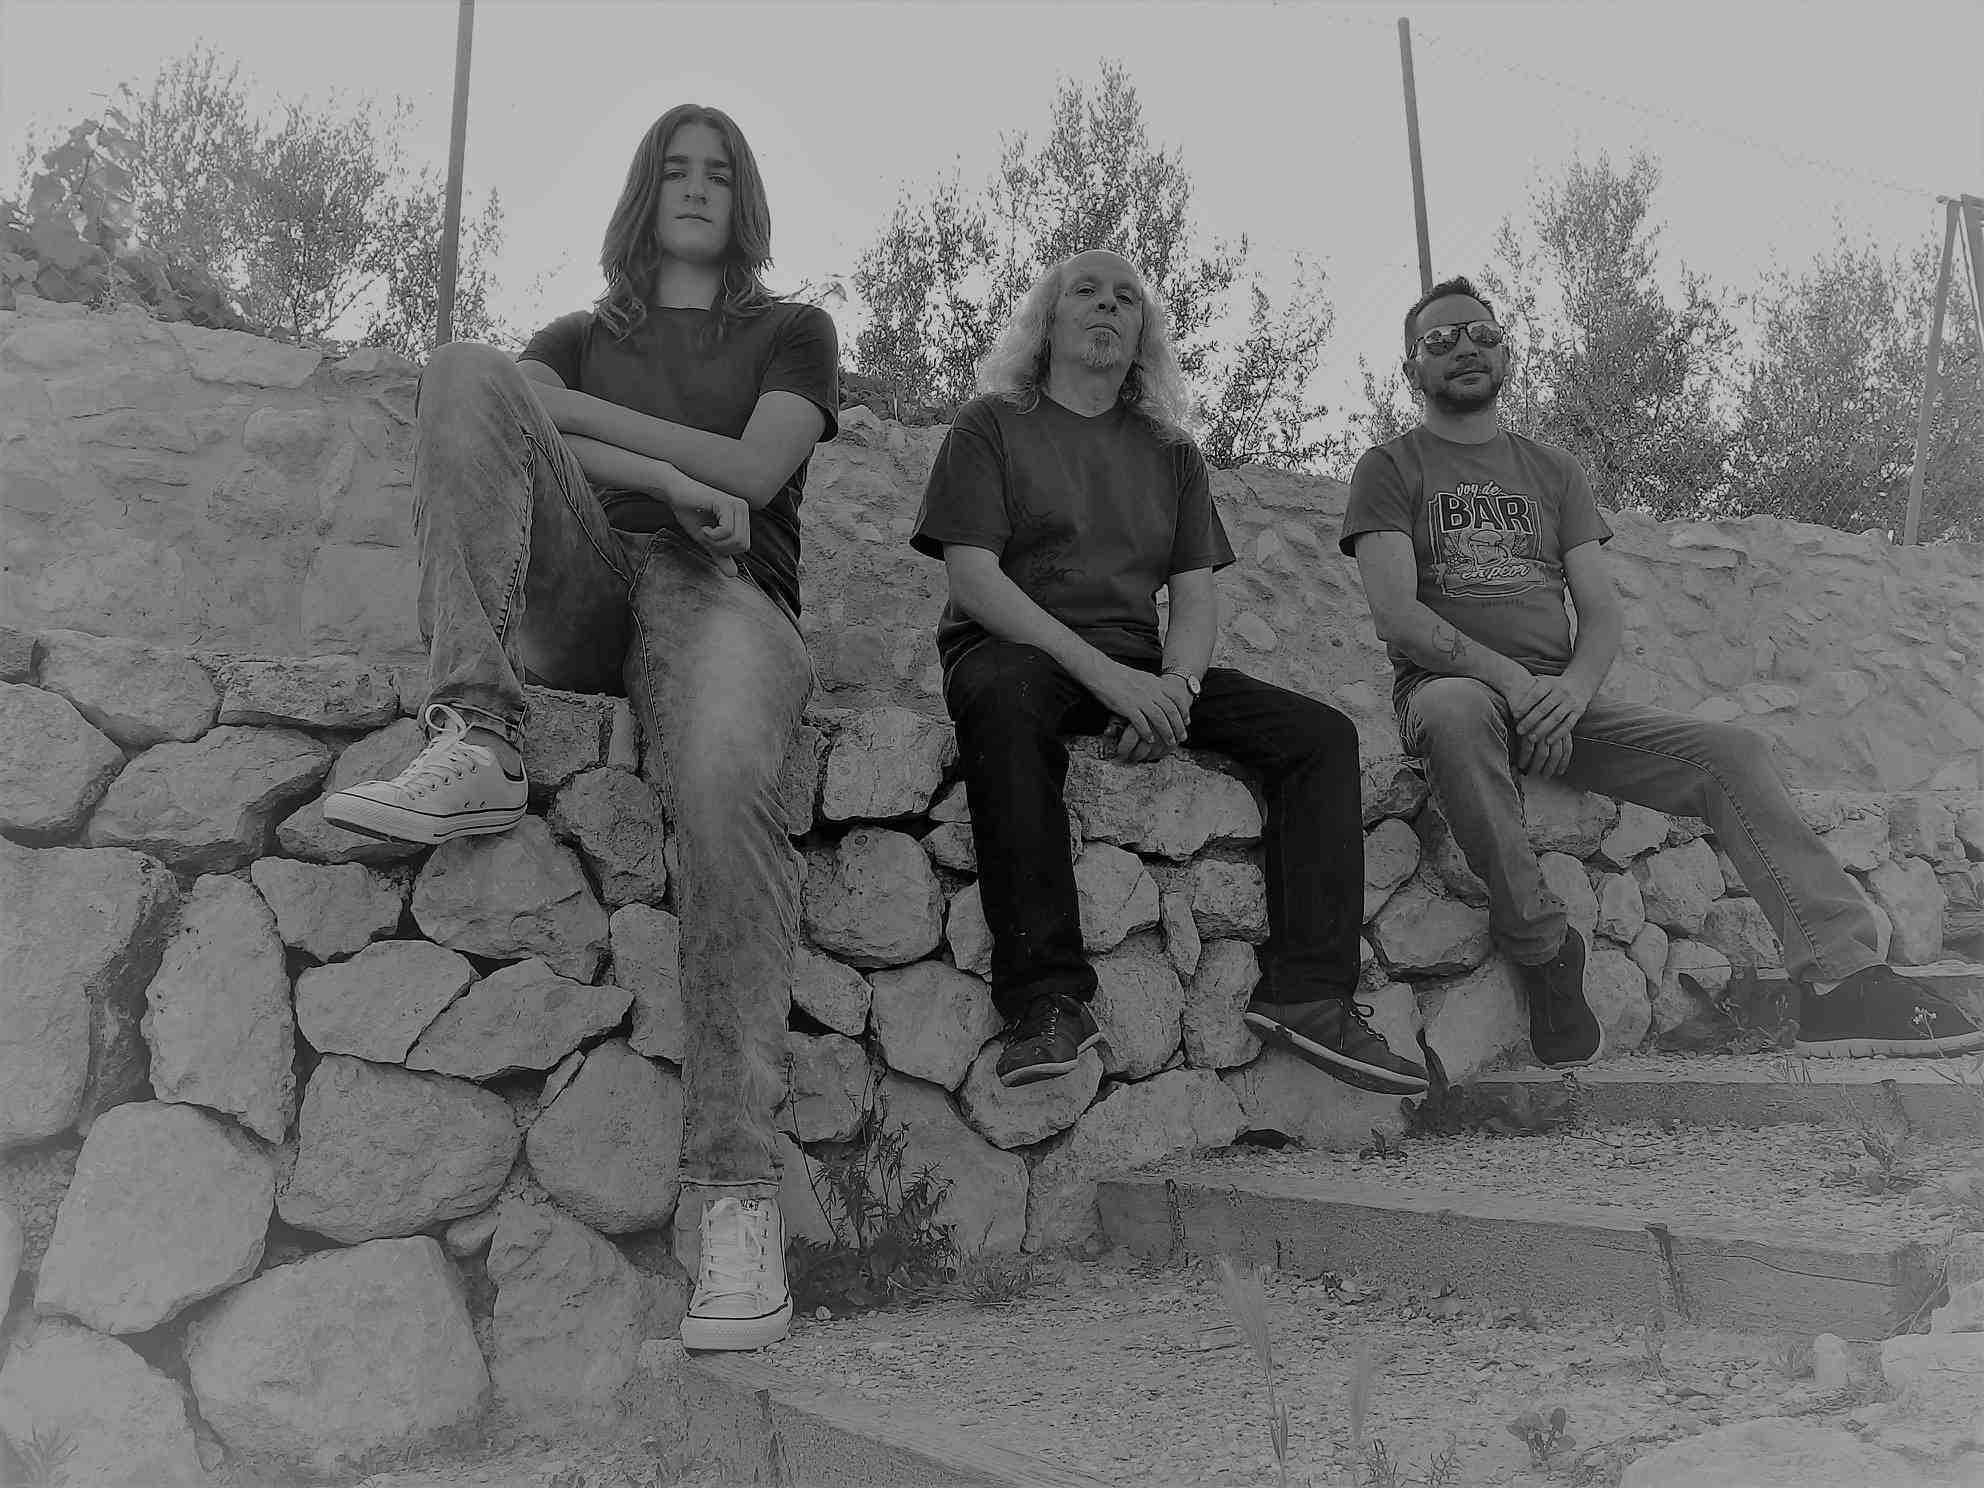 Badana presenta en directe el seu nou disc el 9 de març en Alacant